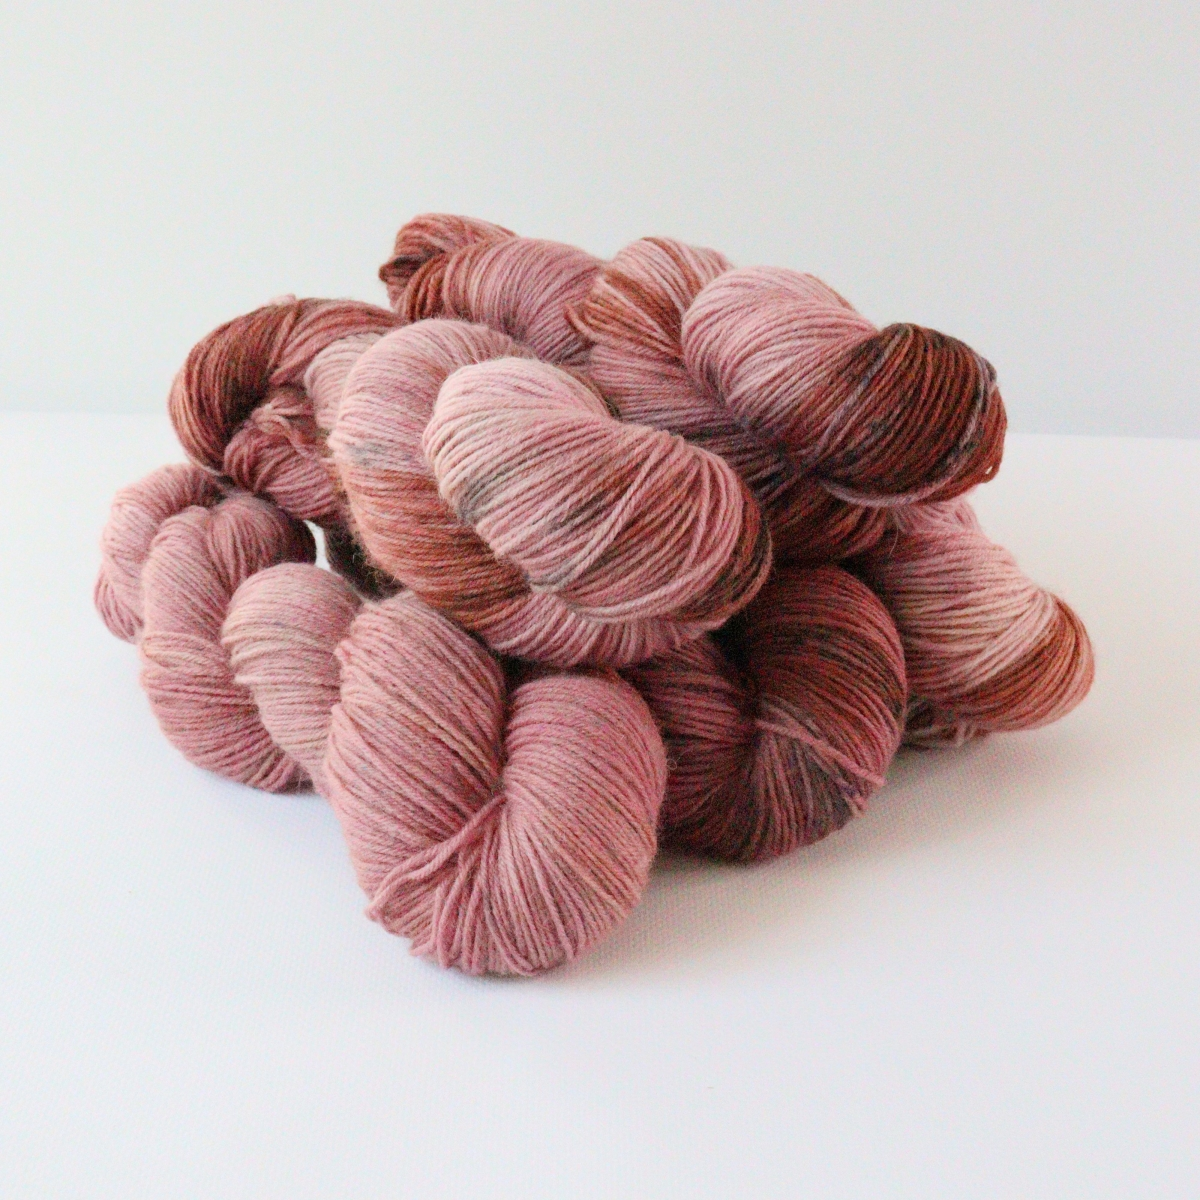 woodico.pro hand dyed yarn 082 1 1200x1200 - Hand dyed yarn / 082